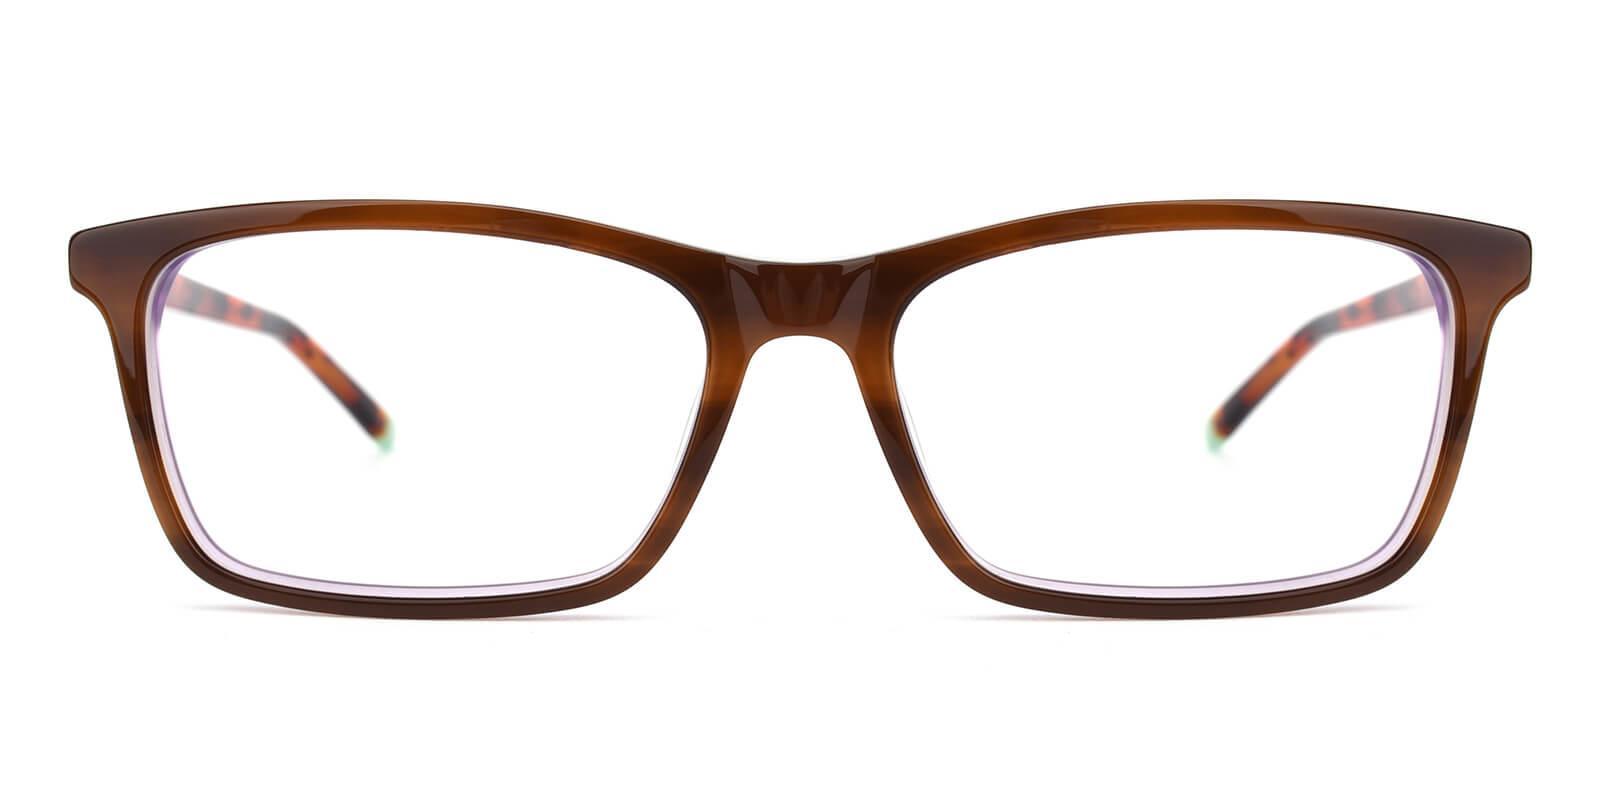 Crane-Striped-Acetate-Eyeglasses-detail